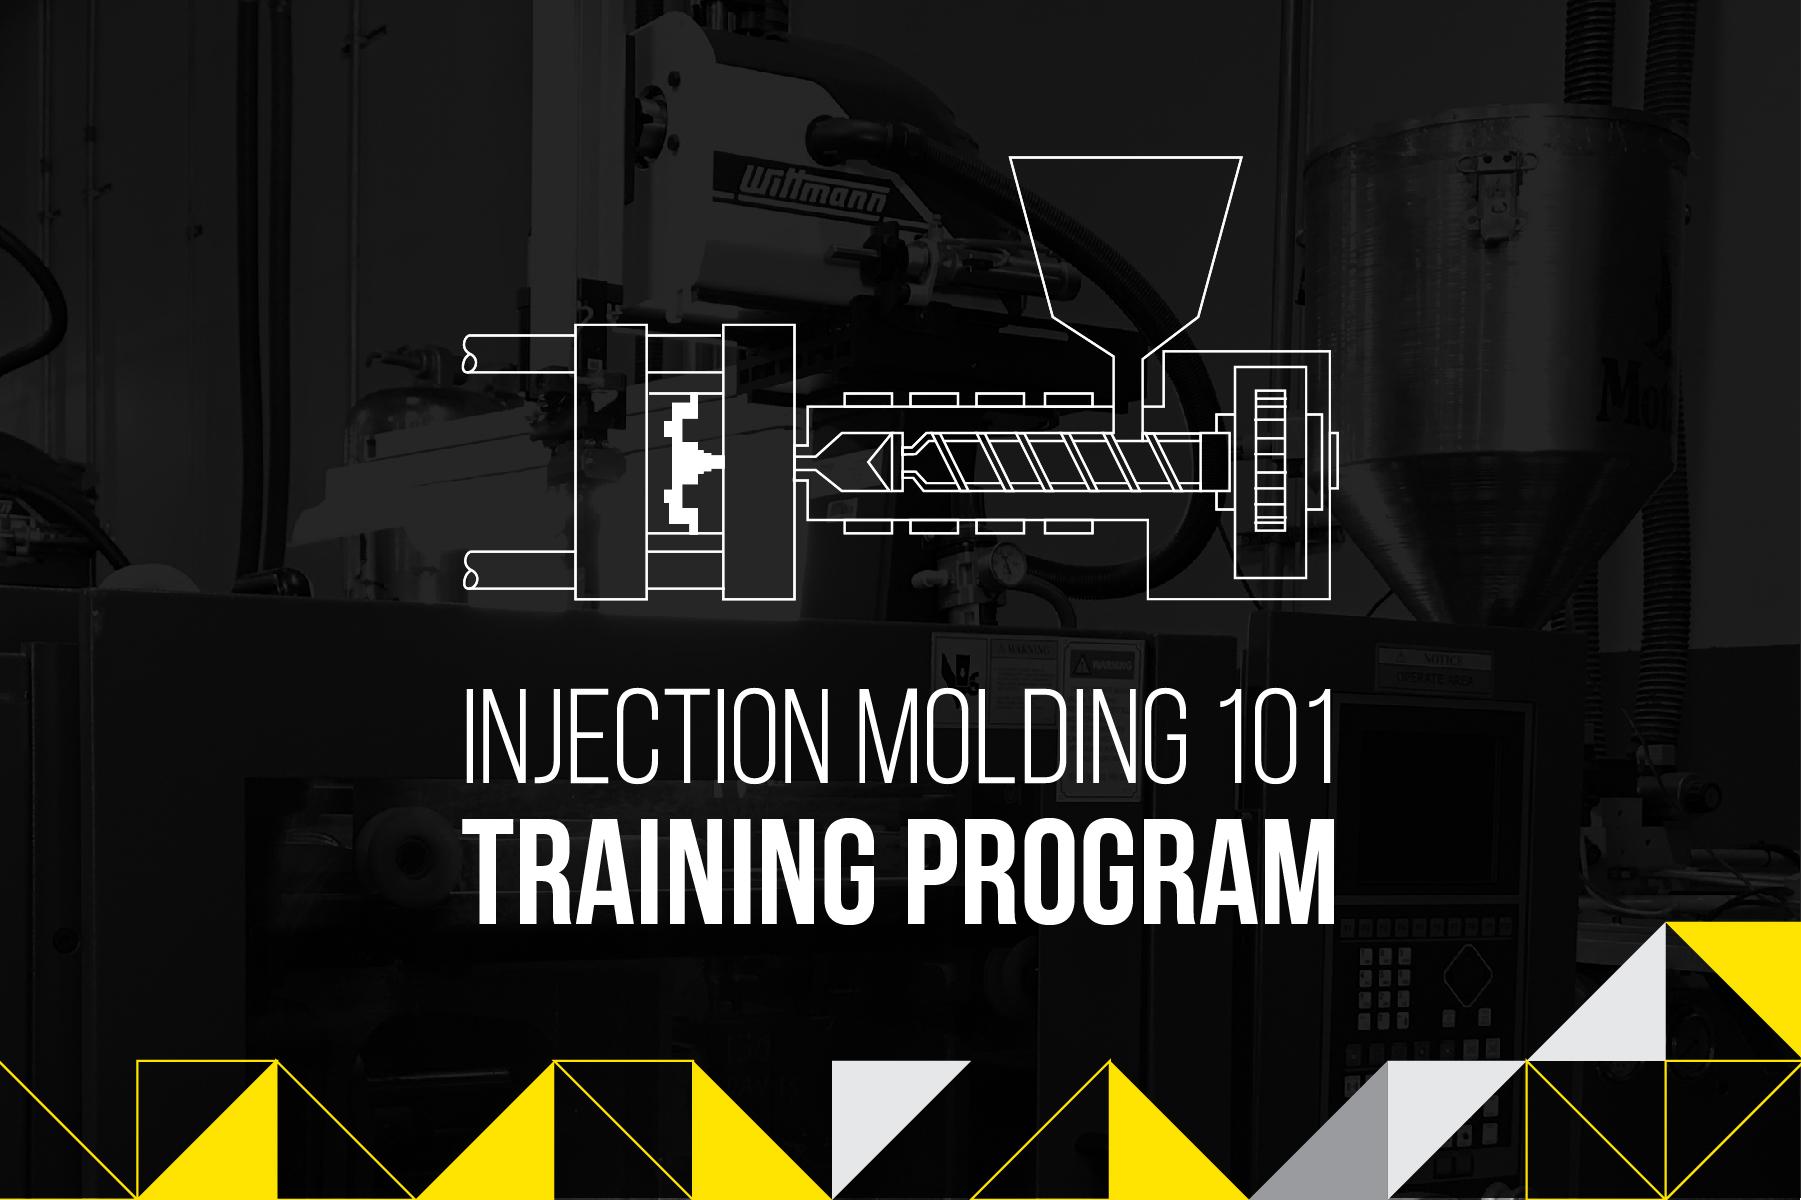 Tooling & Plastic Injection Molding (San Leandro)-FATHOM